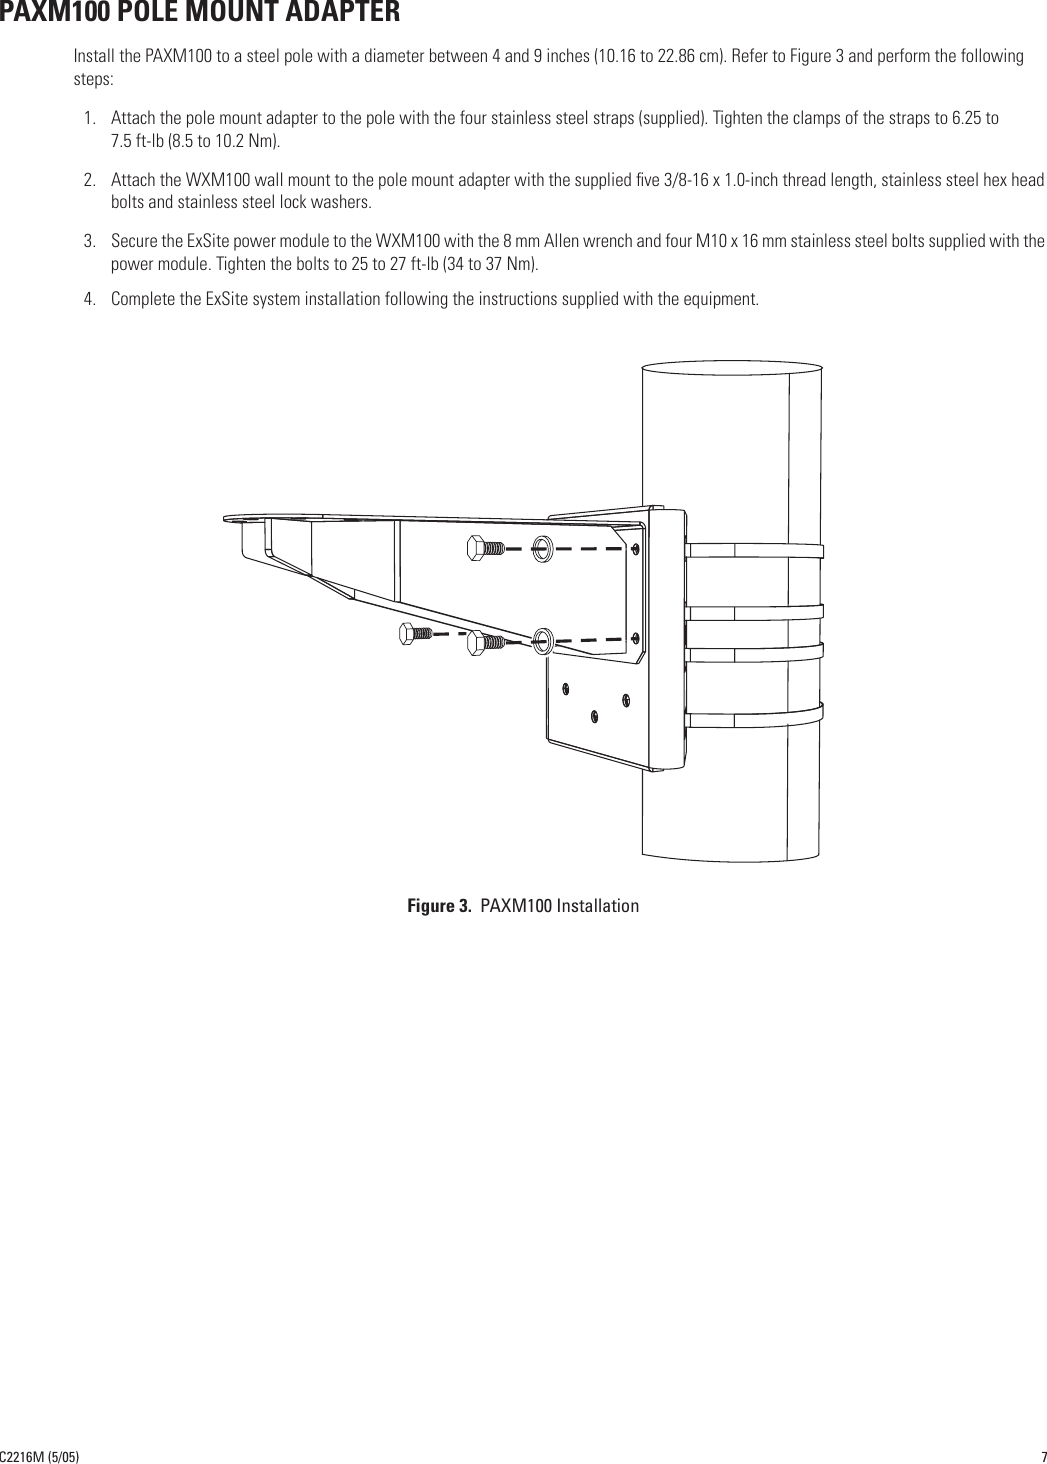 Pelco Home Security System Cmxm100 Users Manual C2216M ExSite Mount